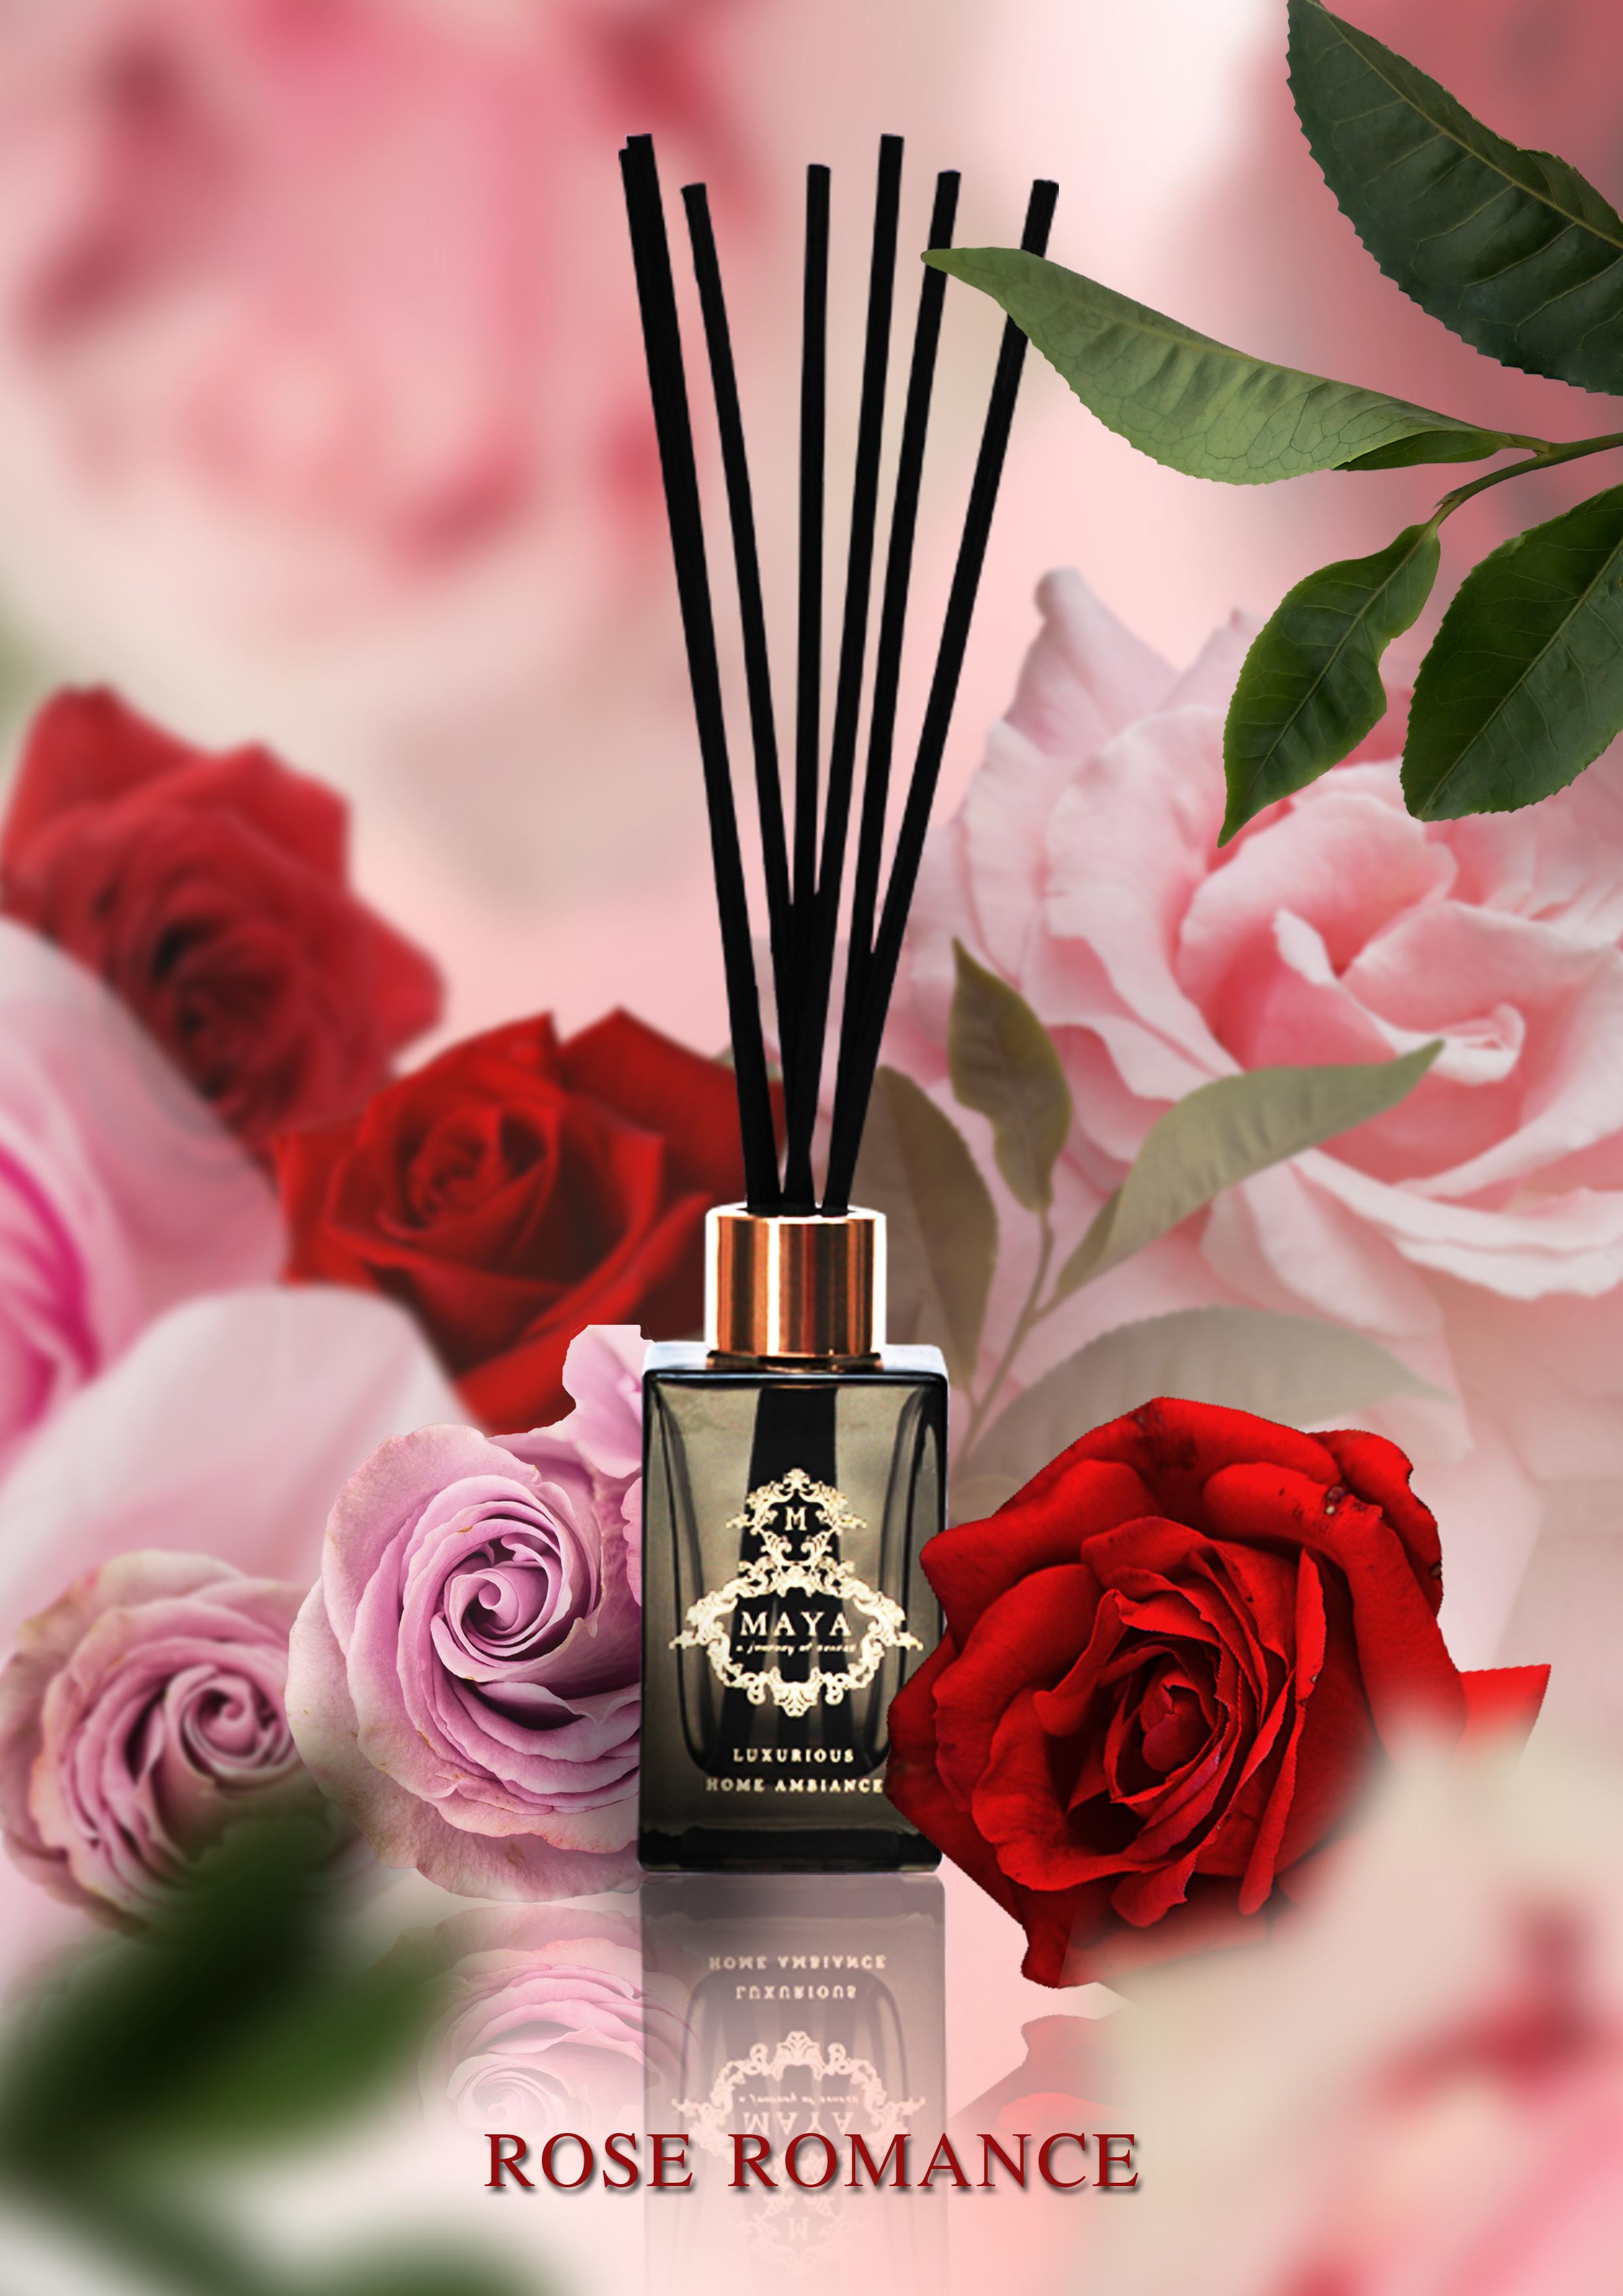 REED DIFFUSER ROSE ROMANCE กลิ่นหอมเอกลักษณ์จากดอกกุหลาบ